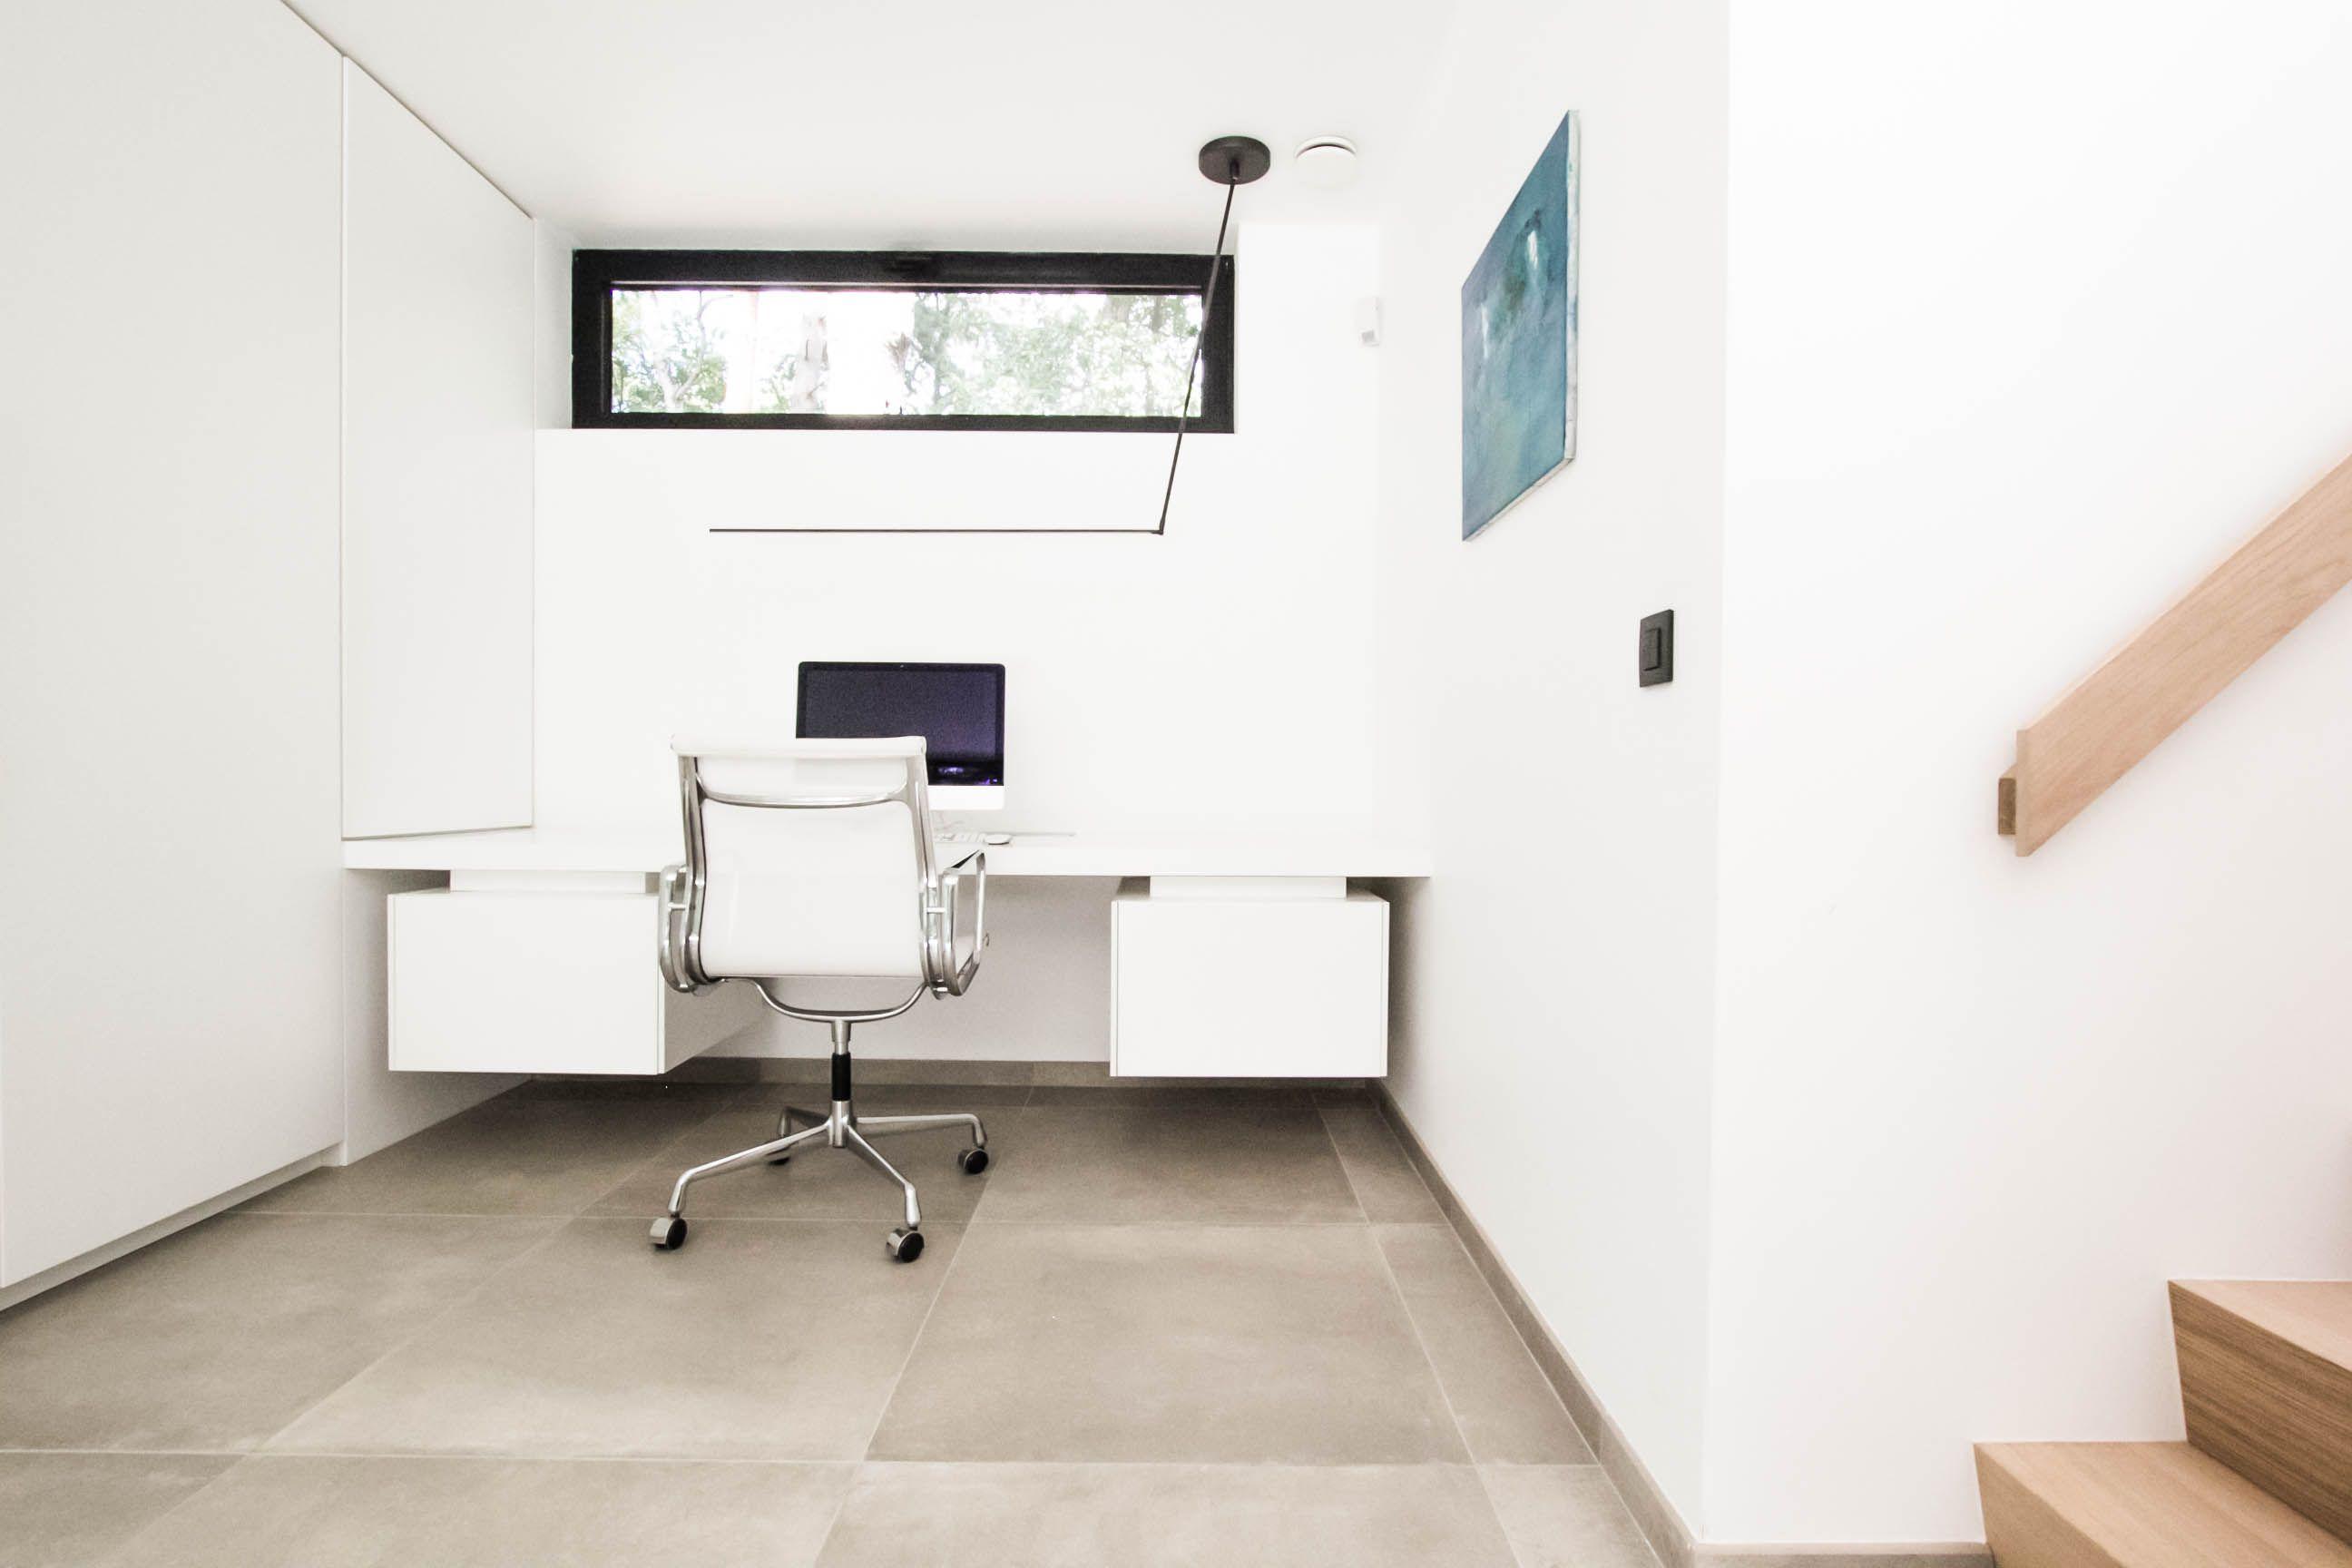 Homeoffice bureau integreren in een modern interieur solid